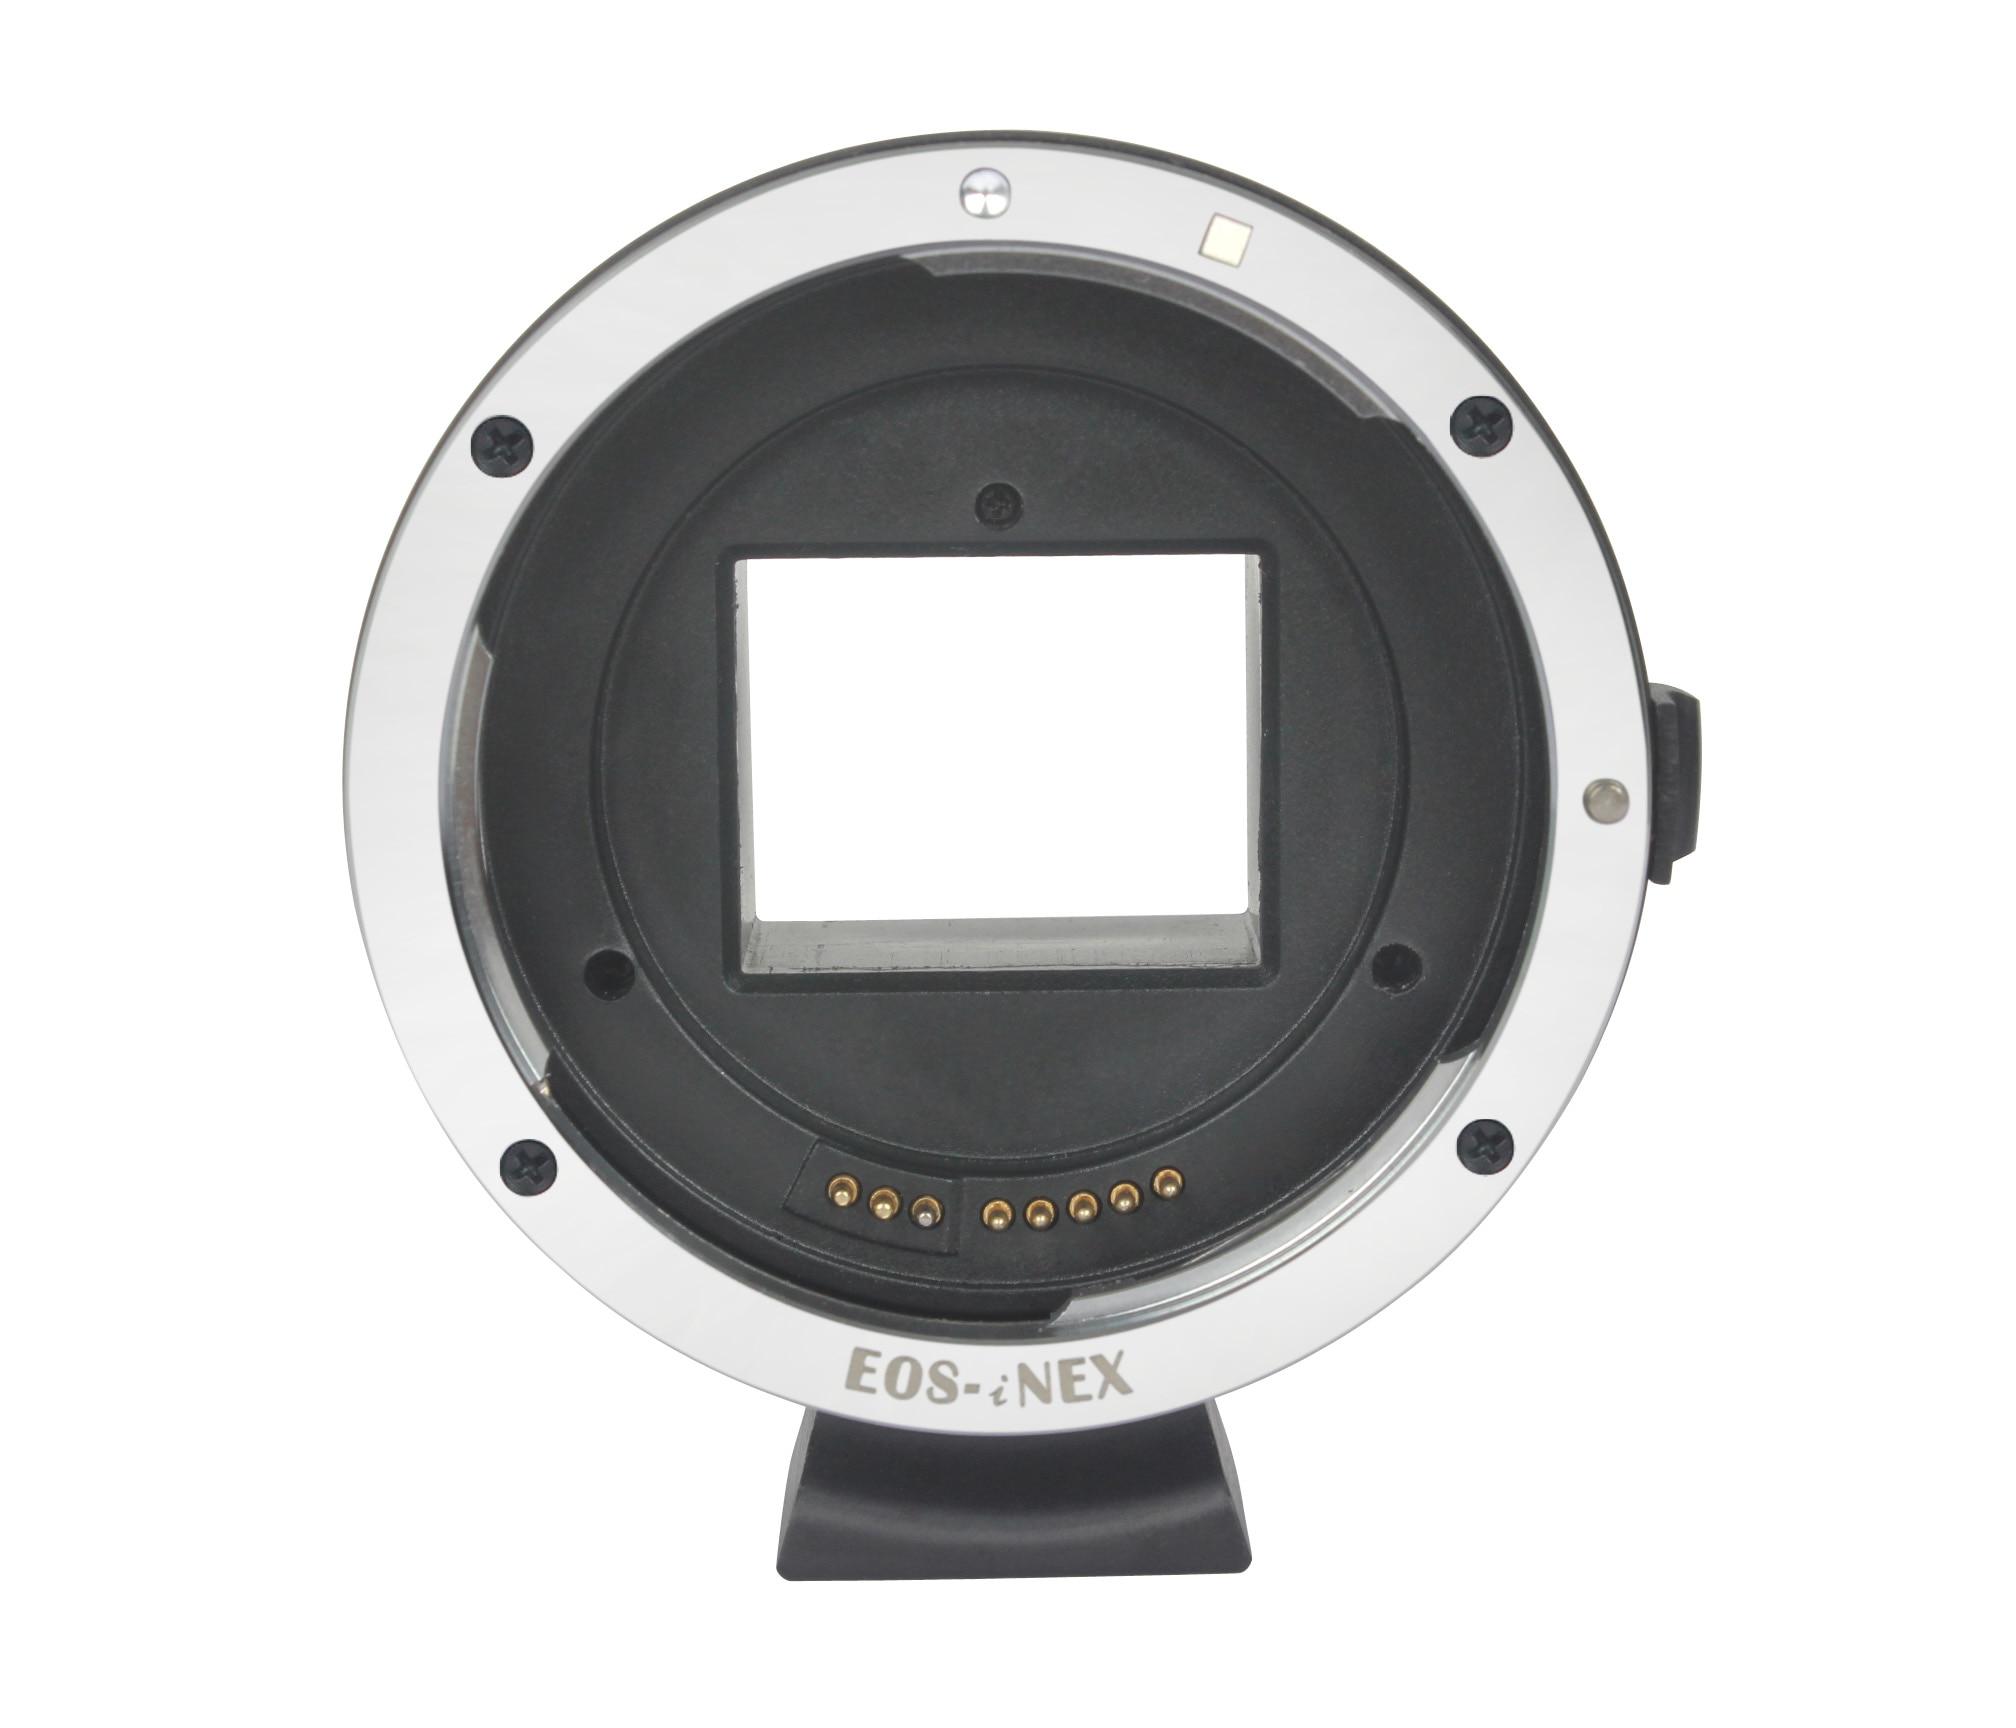 AF Auto Focus Lens Mount Ring Adapter EFs NEX EF NEX For EOS NEX EF EF s Lens And NEX 5T 5N 6 7 F3 A6300 A6000 A5000 A5100